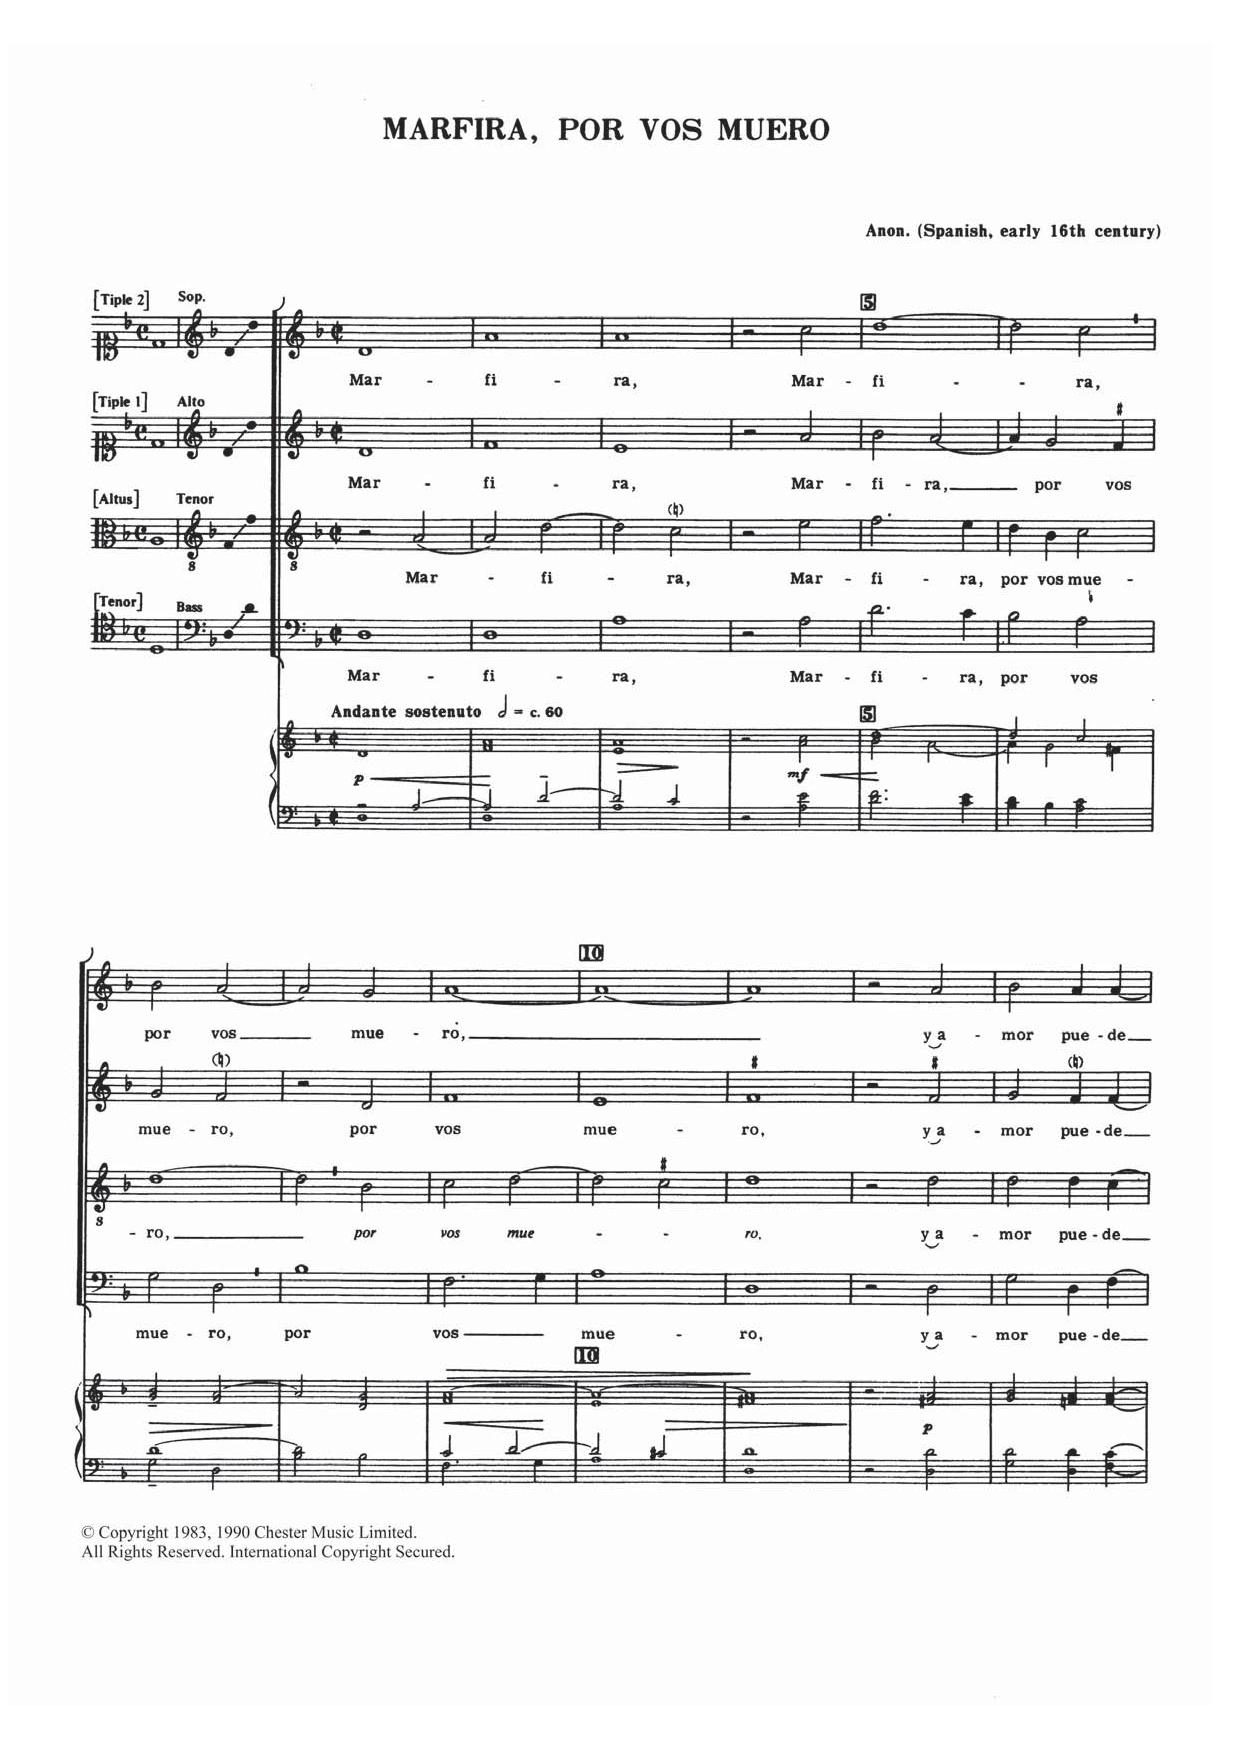 Traditional Marfira, Por Vos Muero sheet music notes and chords. Download Printable PDF.